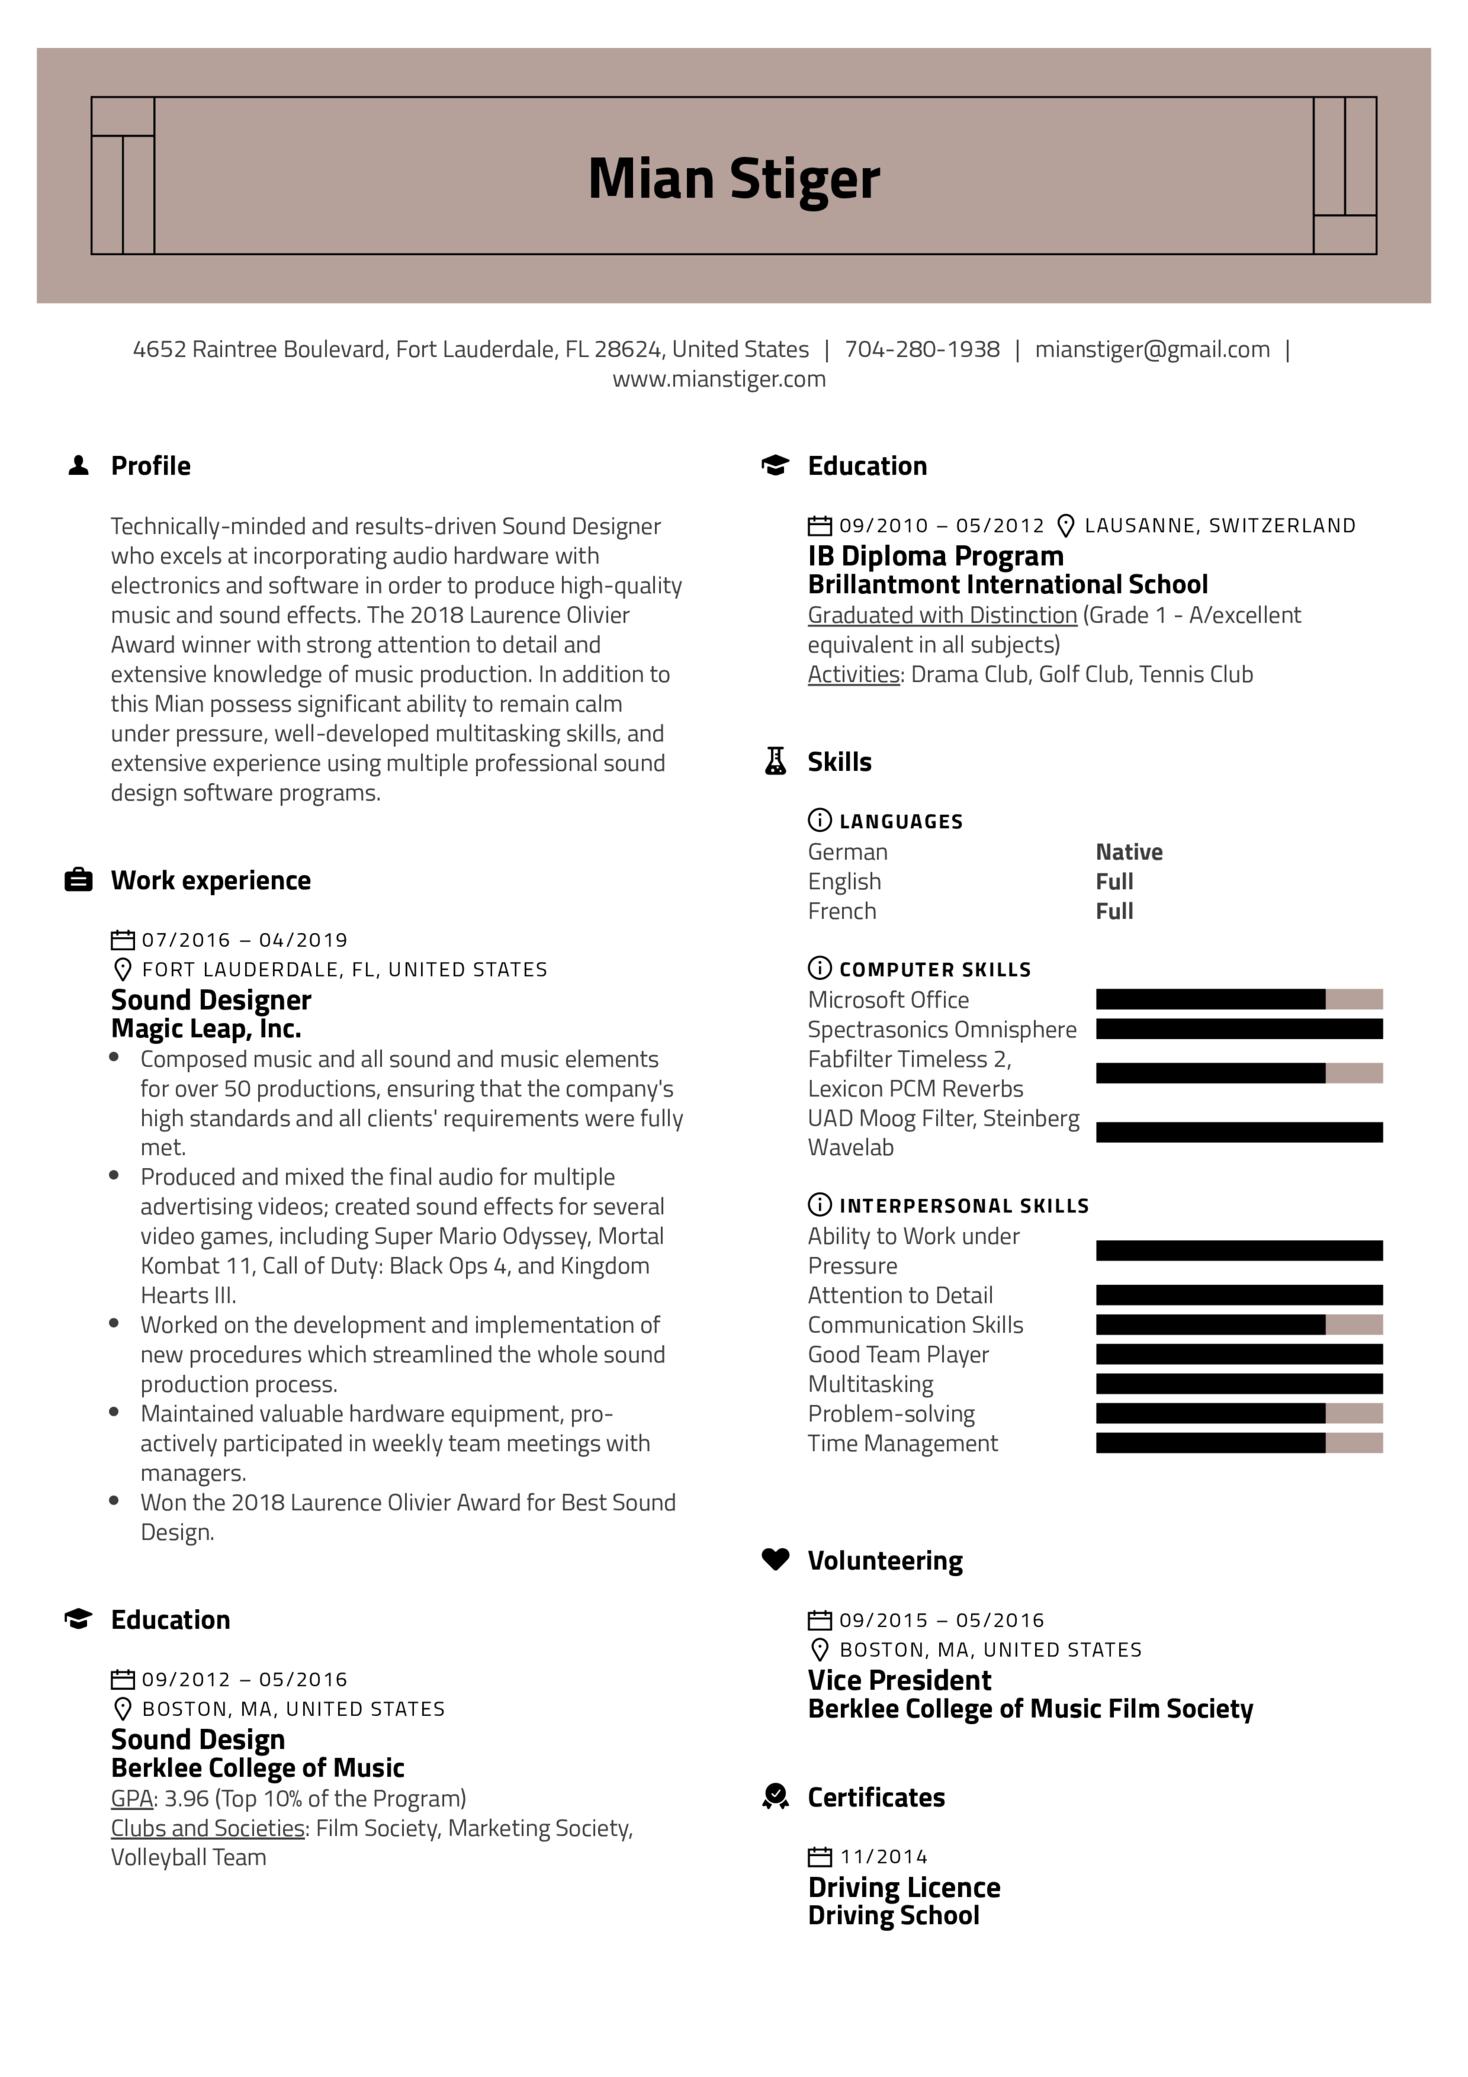 Sound Designer Resume Sample (Part 1)